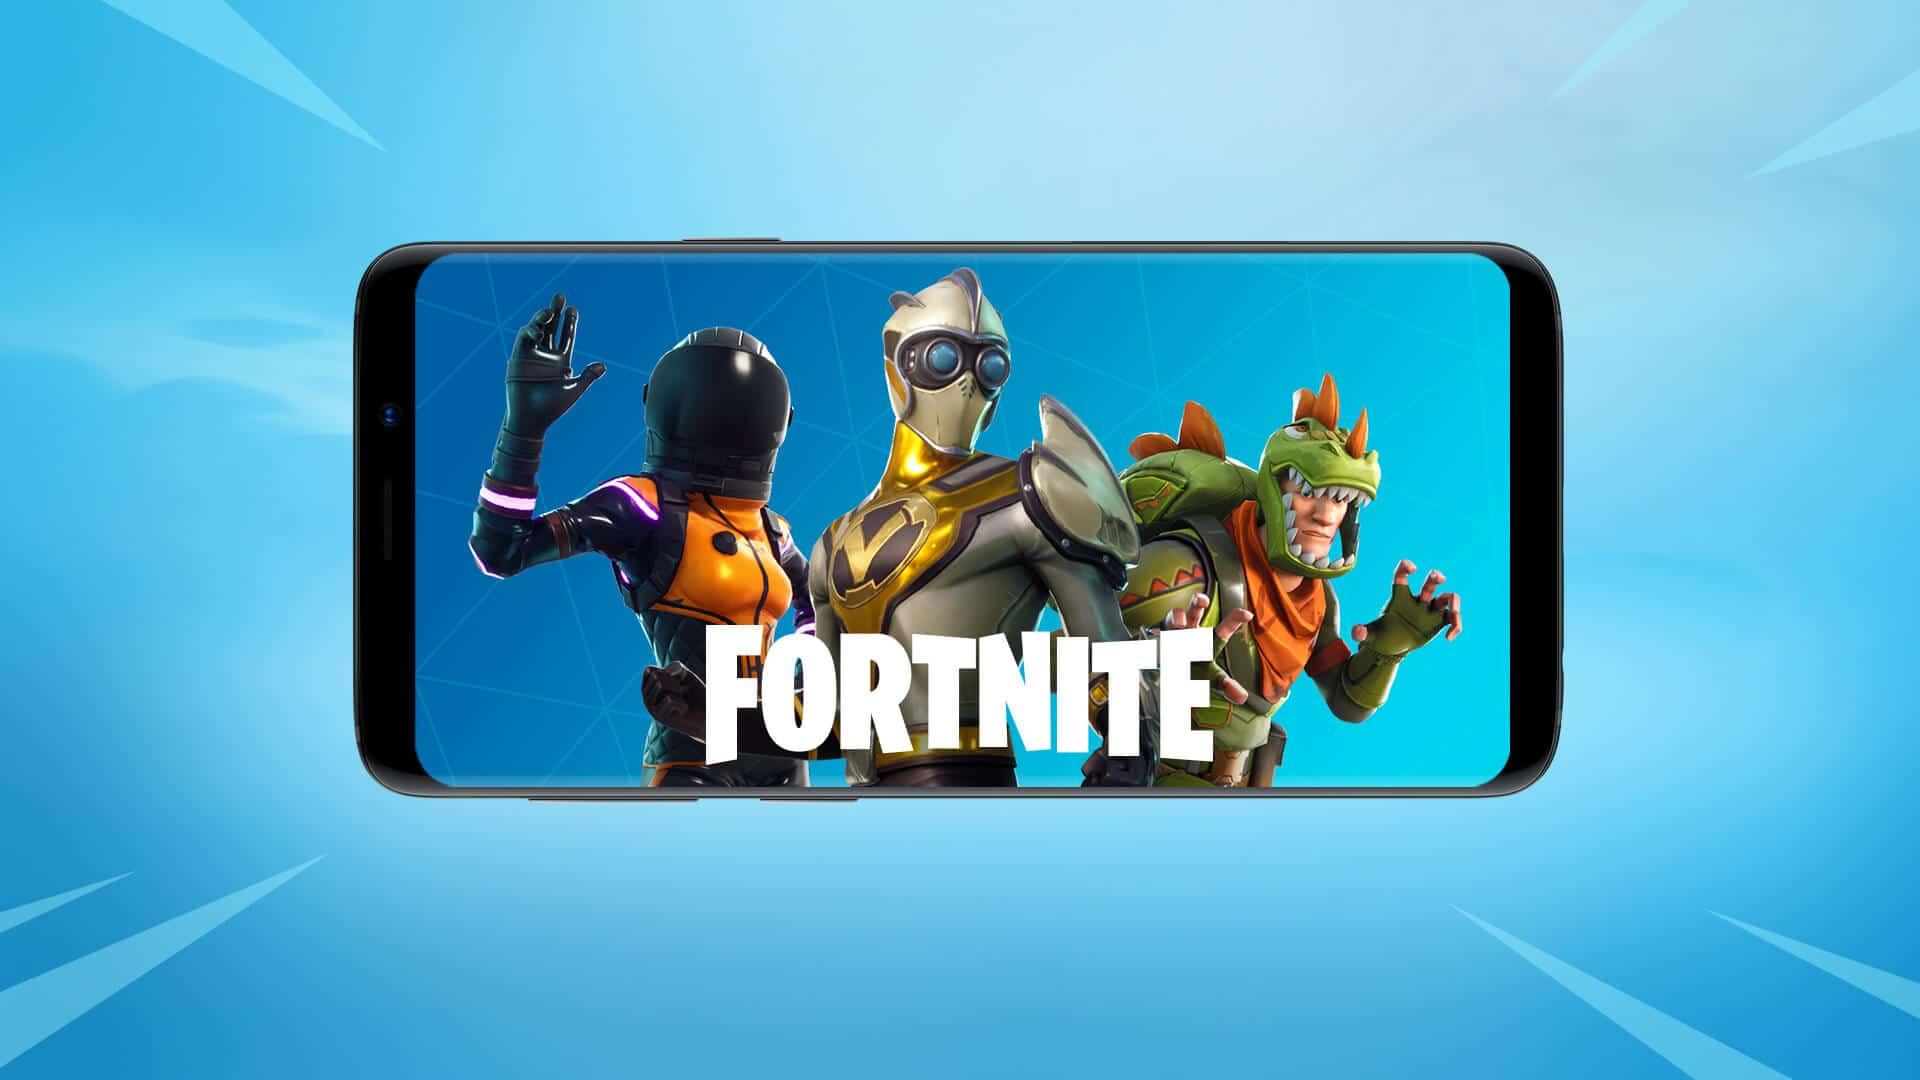 installer fortnite, Comment installer Fortnite sur votre smartphone Android après son bannissement ?